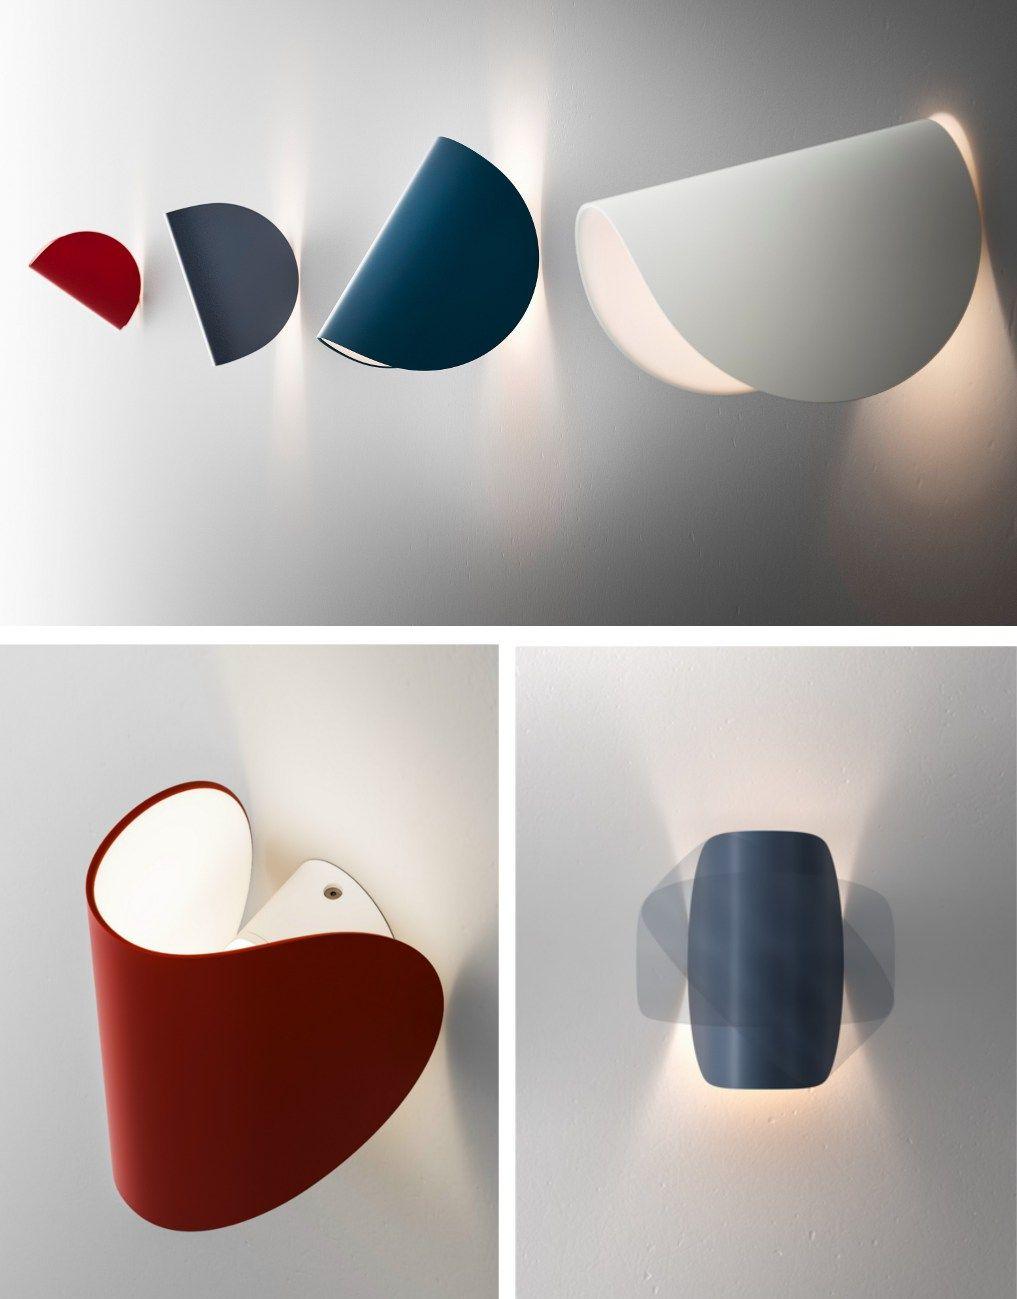 Led Wall Light Io By Fontanaarte Design Claesson Koivisto Rune Wall Lamp Design Wall Lights Led Wall Lights